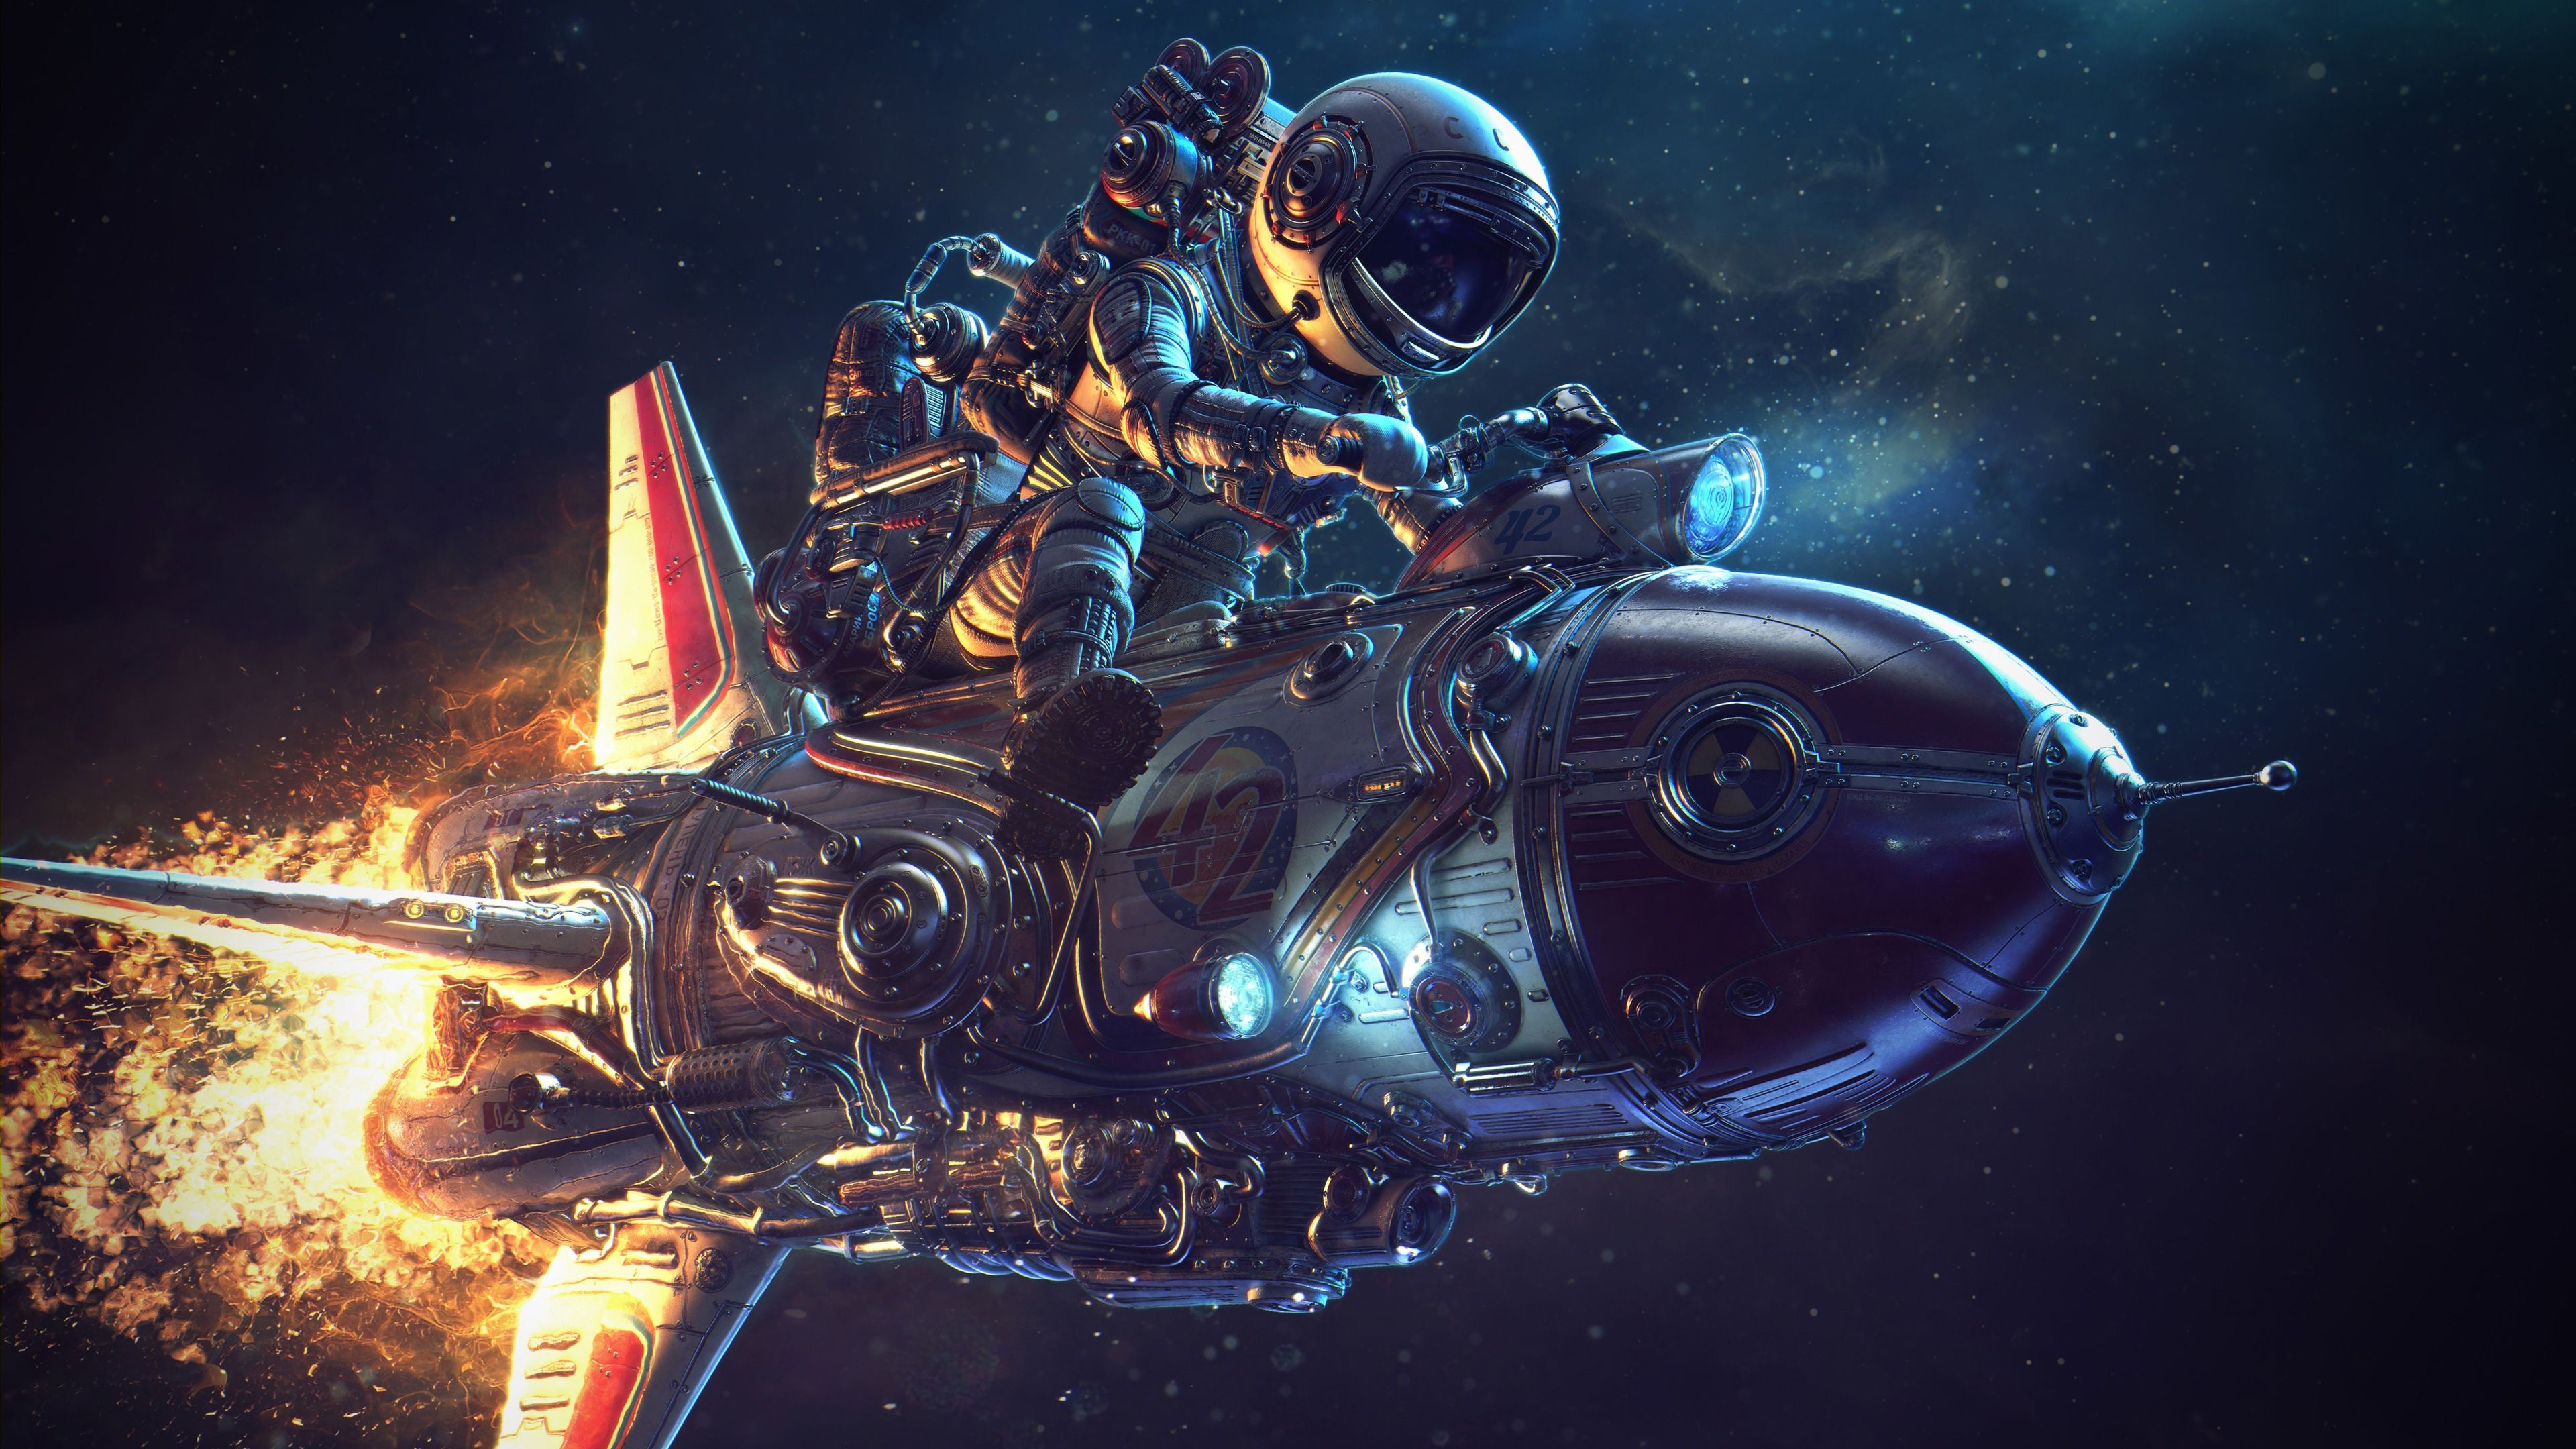 Astronaut Rocket Science Fiction 4k Science Fiction Wallpapers Rocket Wallpapers Hd Wallpapers Digital Art Wallpapers In 2020 Astronaut Wallpaper Astronaut Art Art